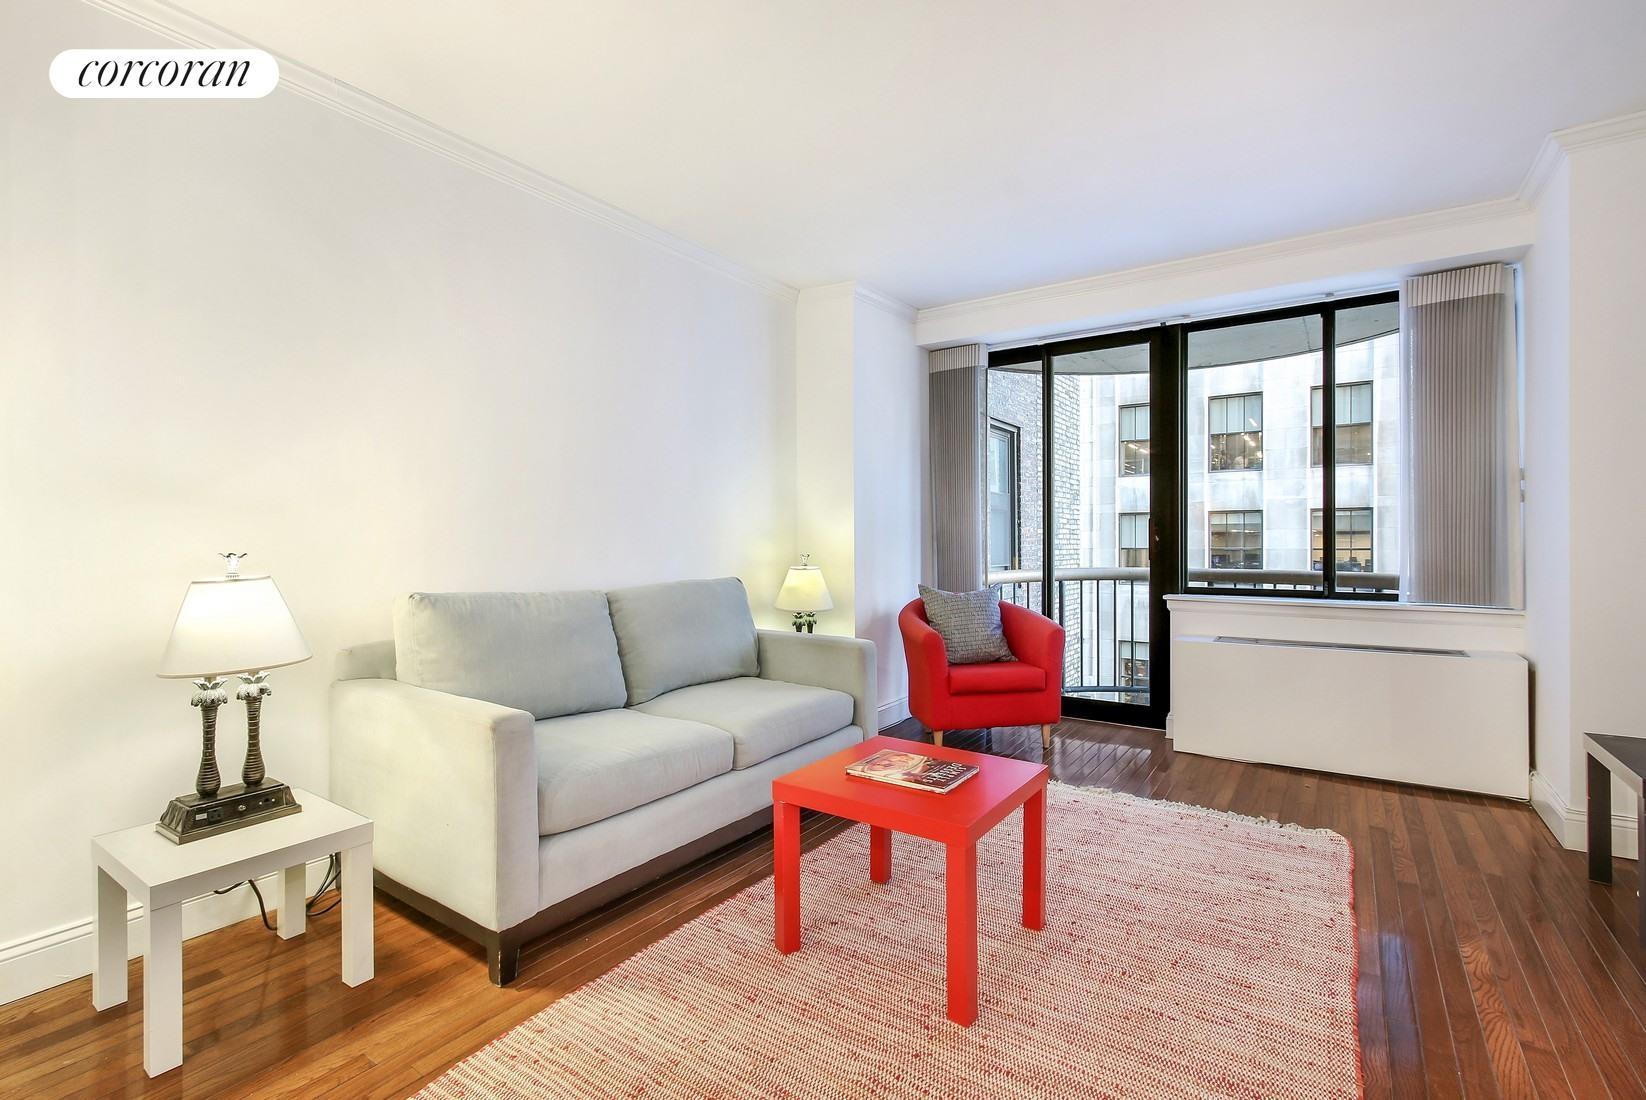 Corcoran, 45 East 25th Street, Apt. 9C, Flatiron Real Estate ...